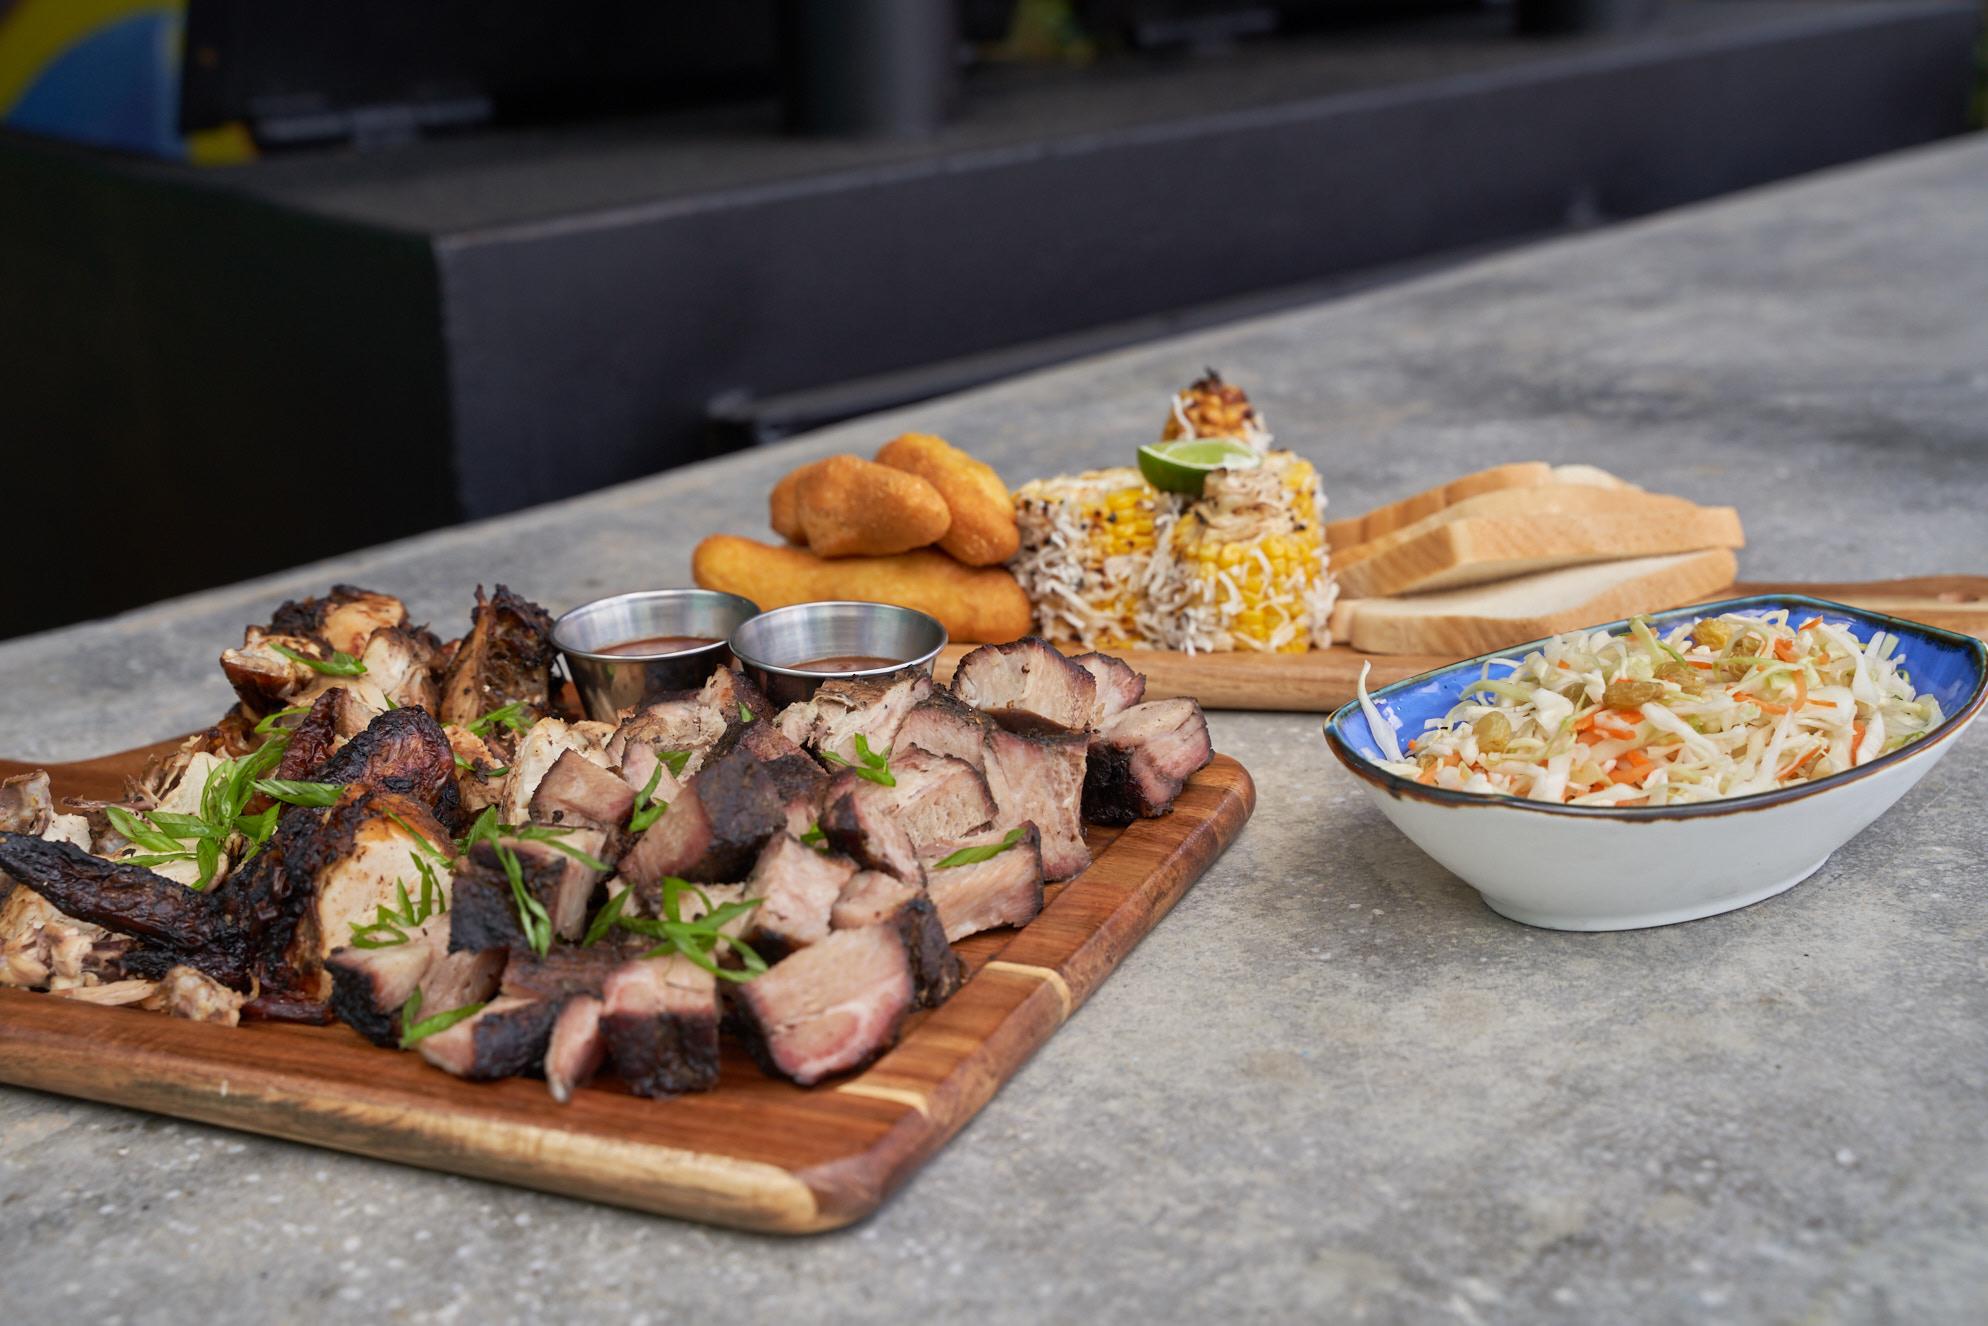 Dukunoo Jamaican Kitchen Brings Modern Caribbean Fare to Wynwood